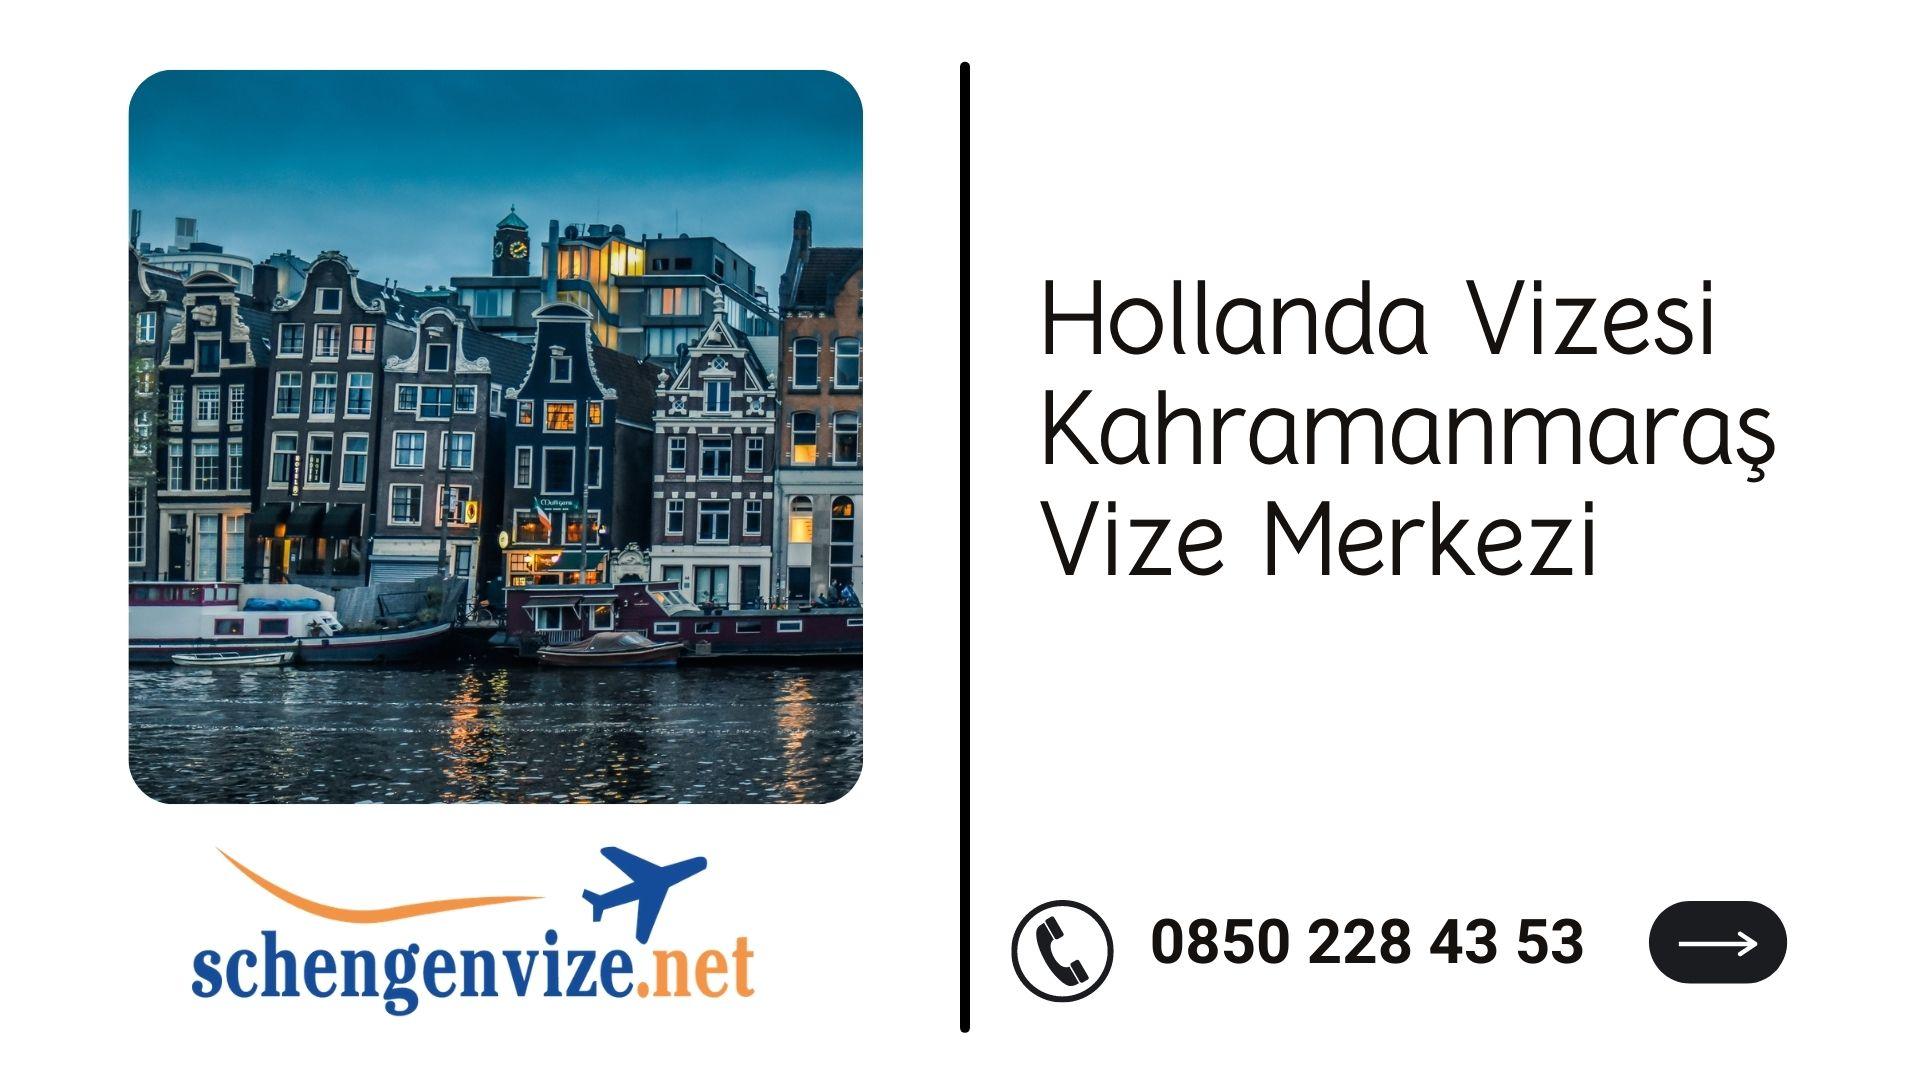 Hollanda Vizesi Kahramanmaraş Vize Merkezi